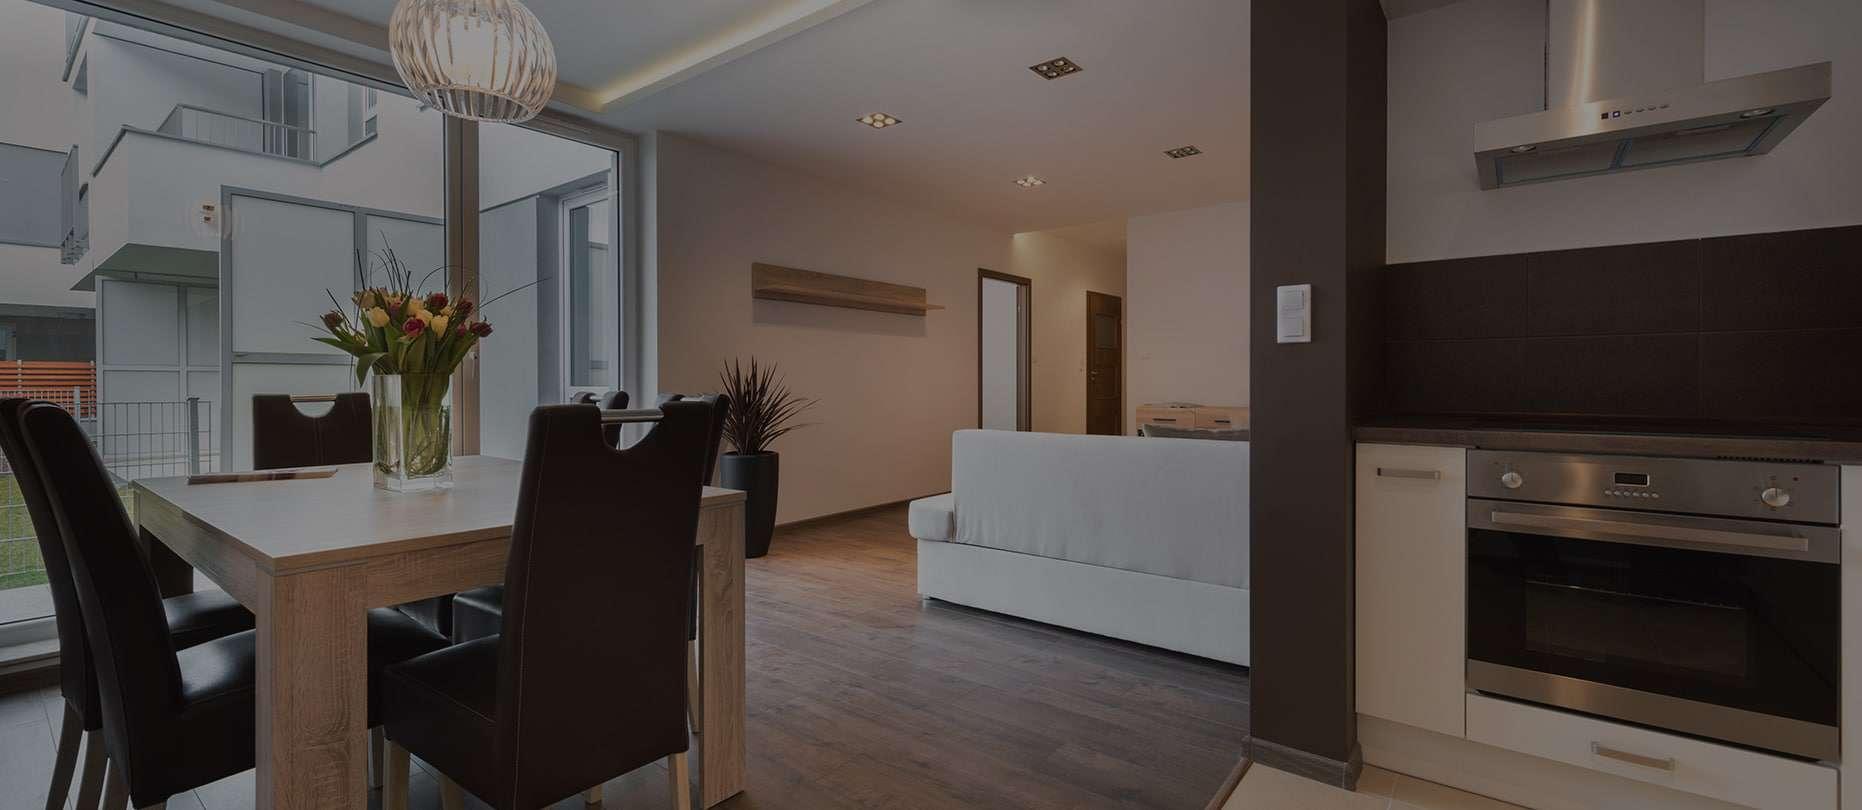 aliminum-timber windows and doors home